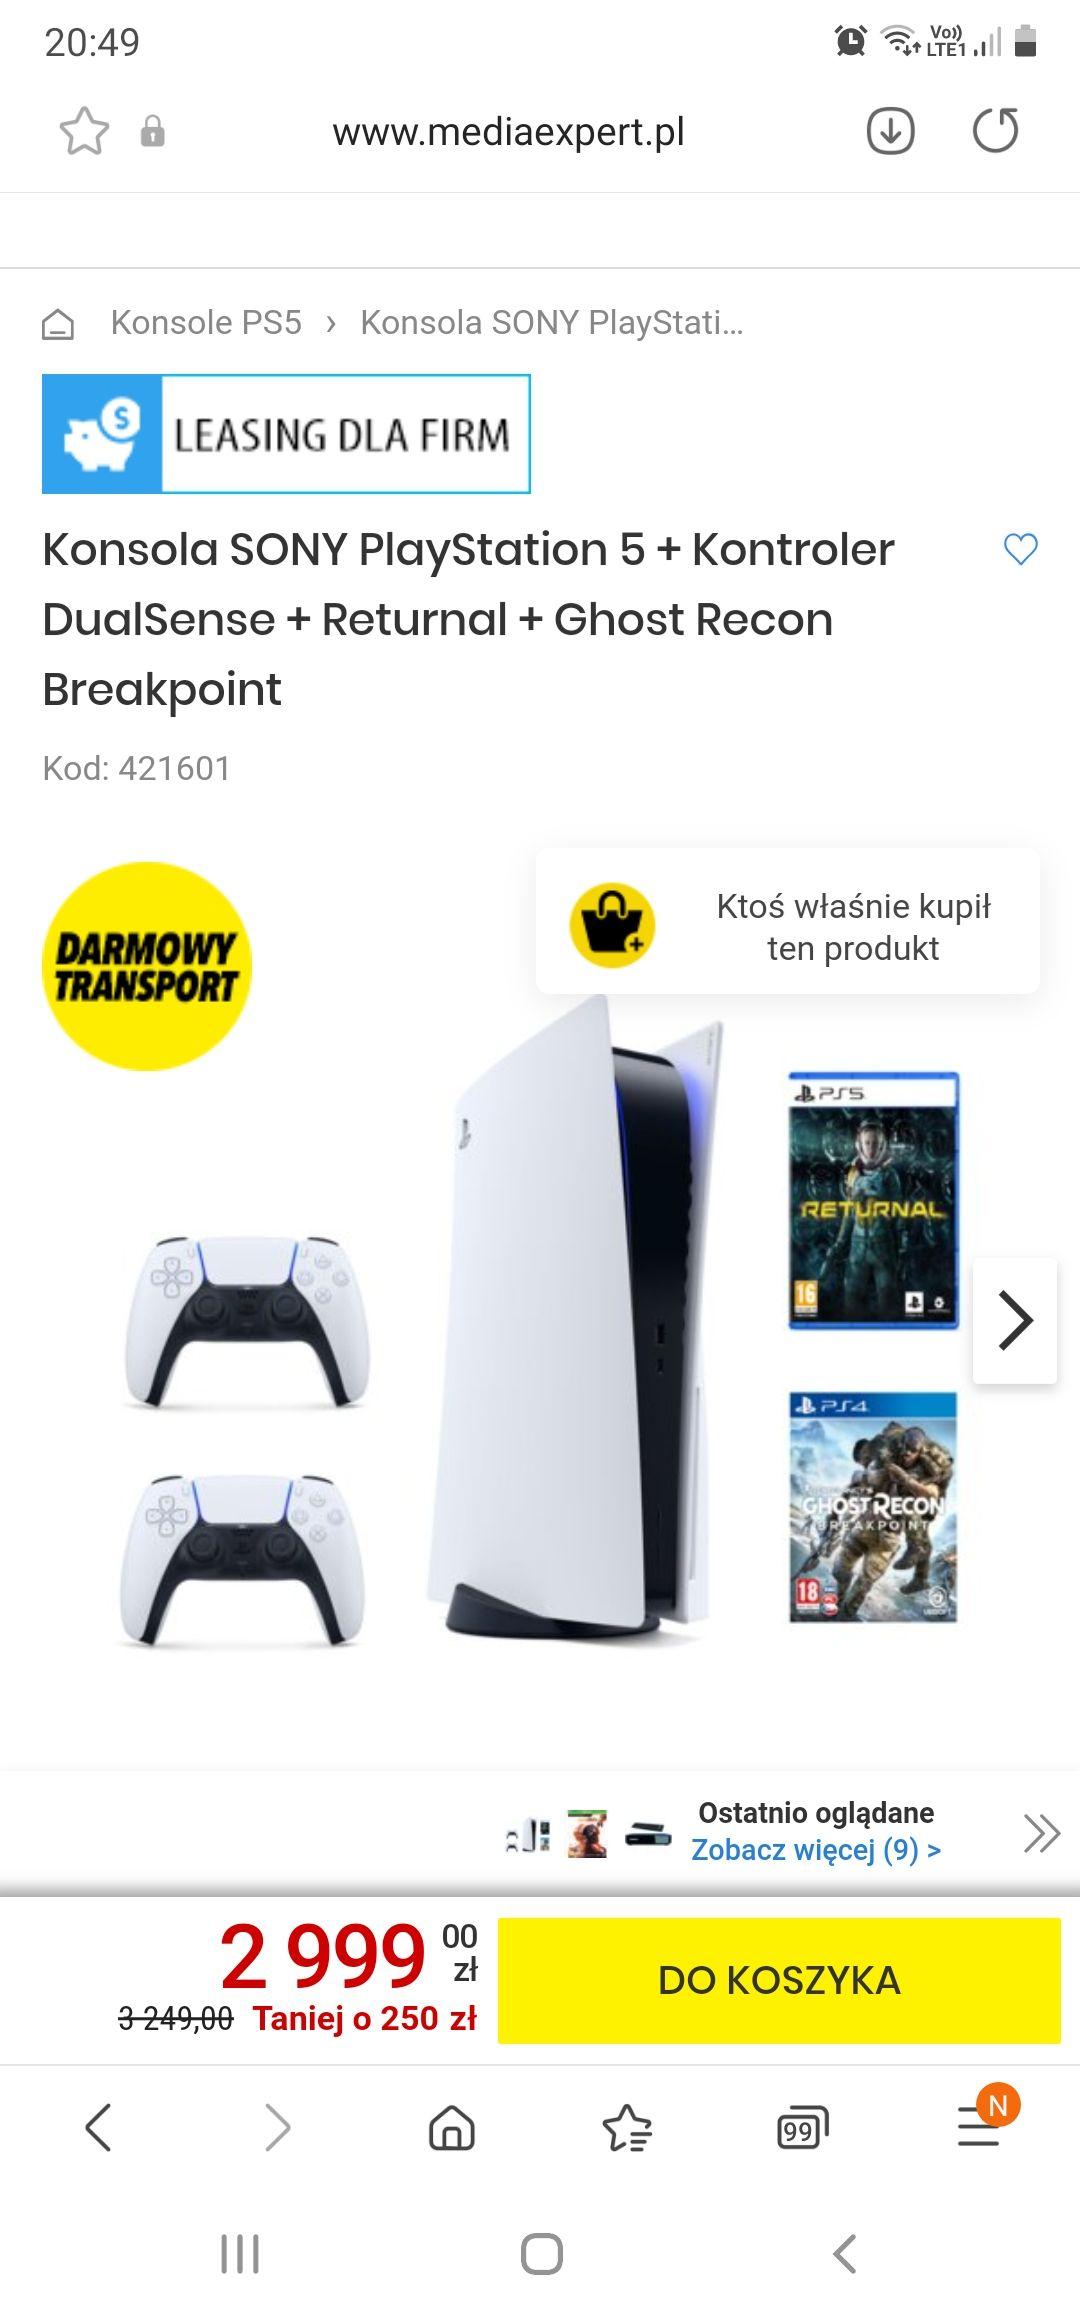 Konsola SONY PlayStation 5 + Kontroler DualSense + Returnal + Ghost Recon Breakpoint